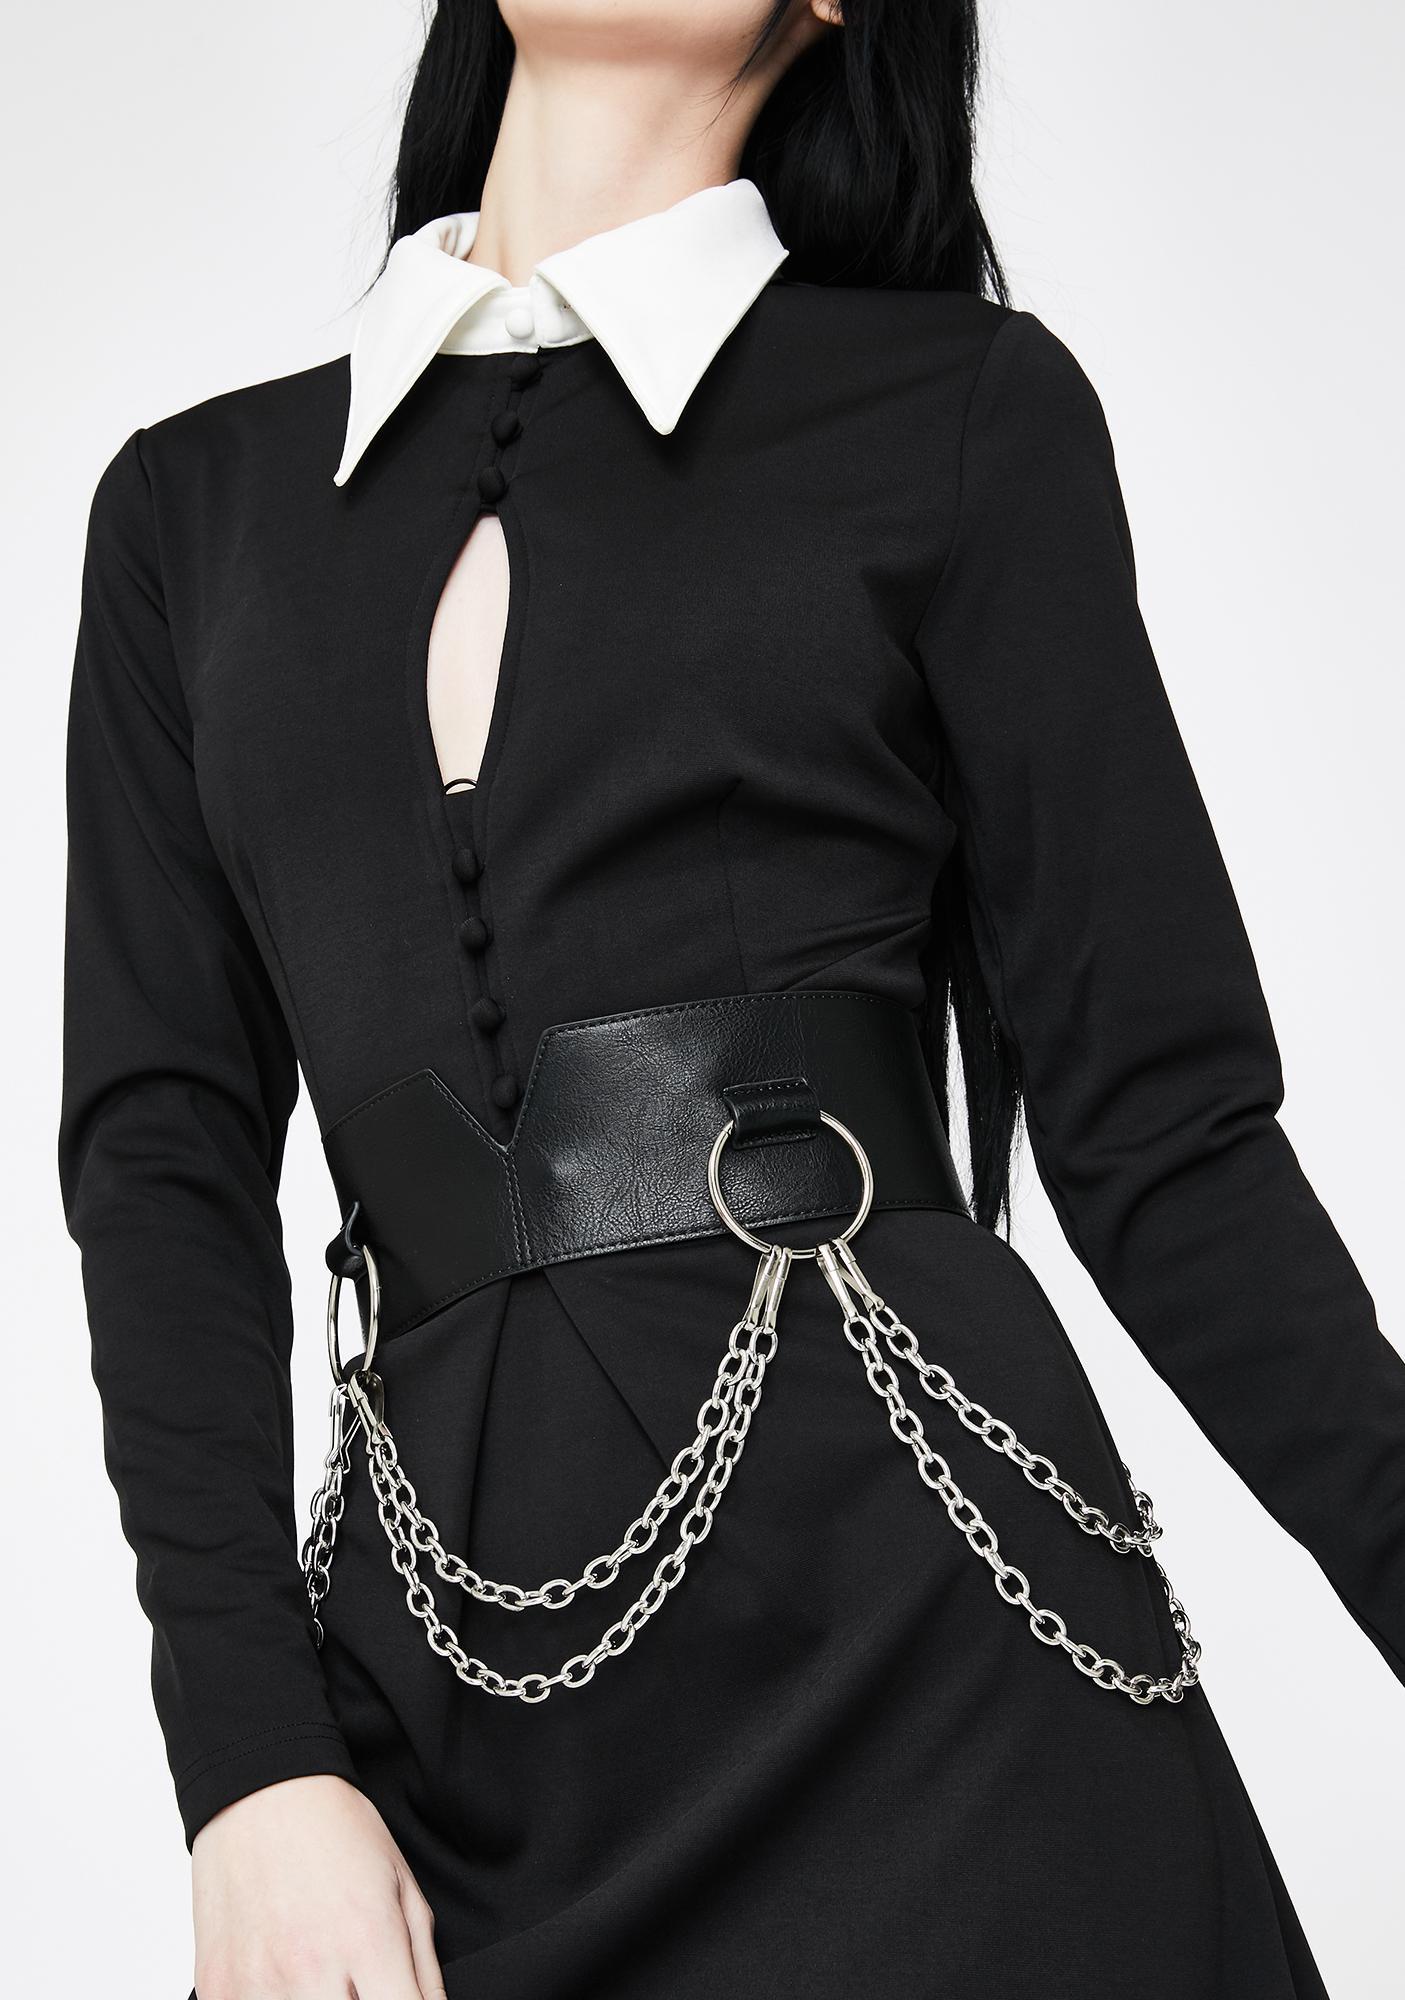 Disturbia Sanction O-Ring Chain Belt